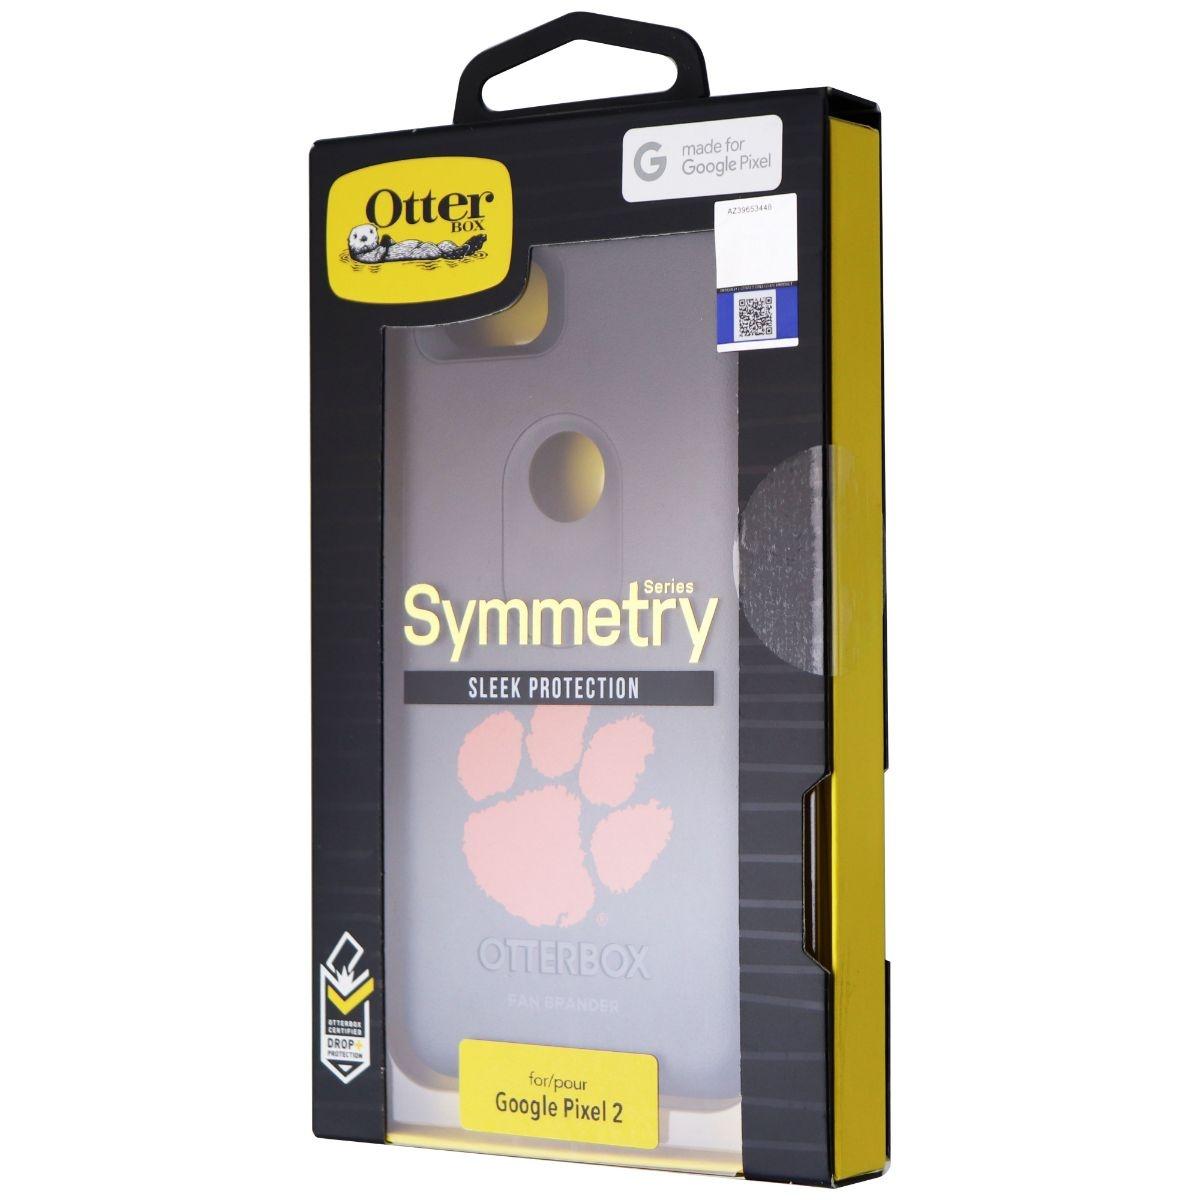 OtterBox Symmetry Fan Brander Series Case for Google Pixel 2 - Black Clemson